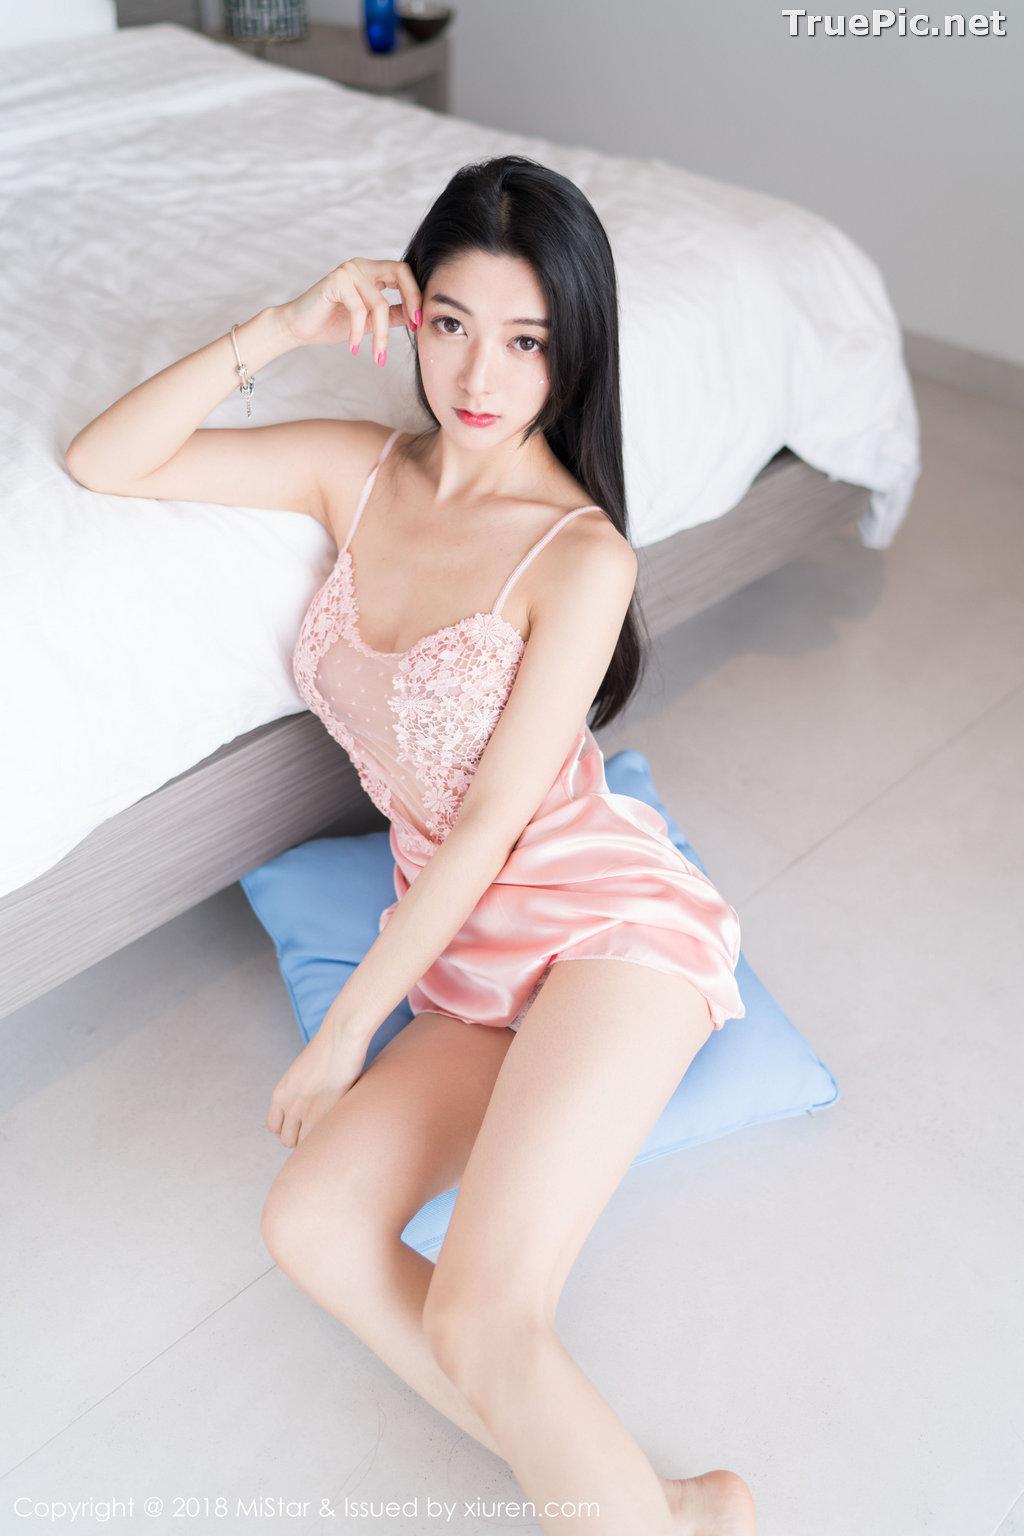 Image MiStar Vol.238 - Chinese Model - Xiao Reba (Angela小热巴) - Sleep Dress and Monokini - TruePic.net - Picture-26